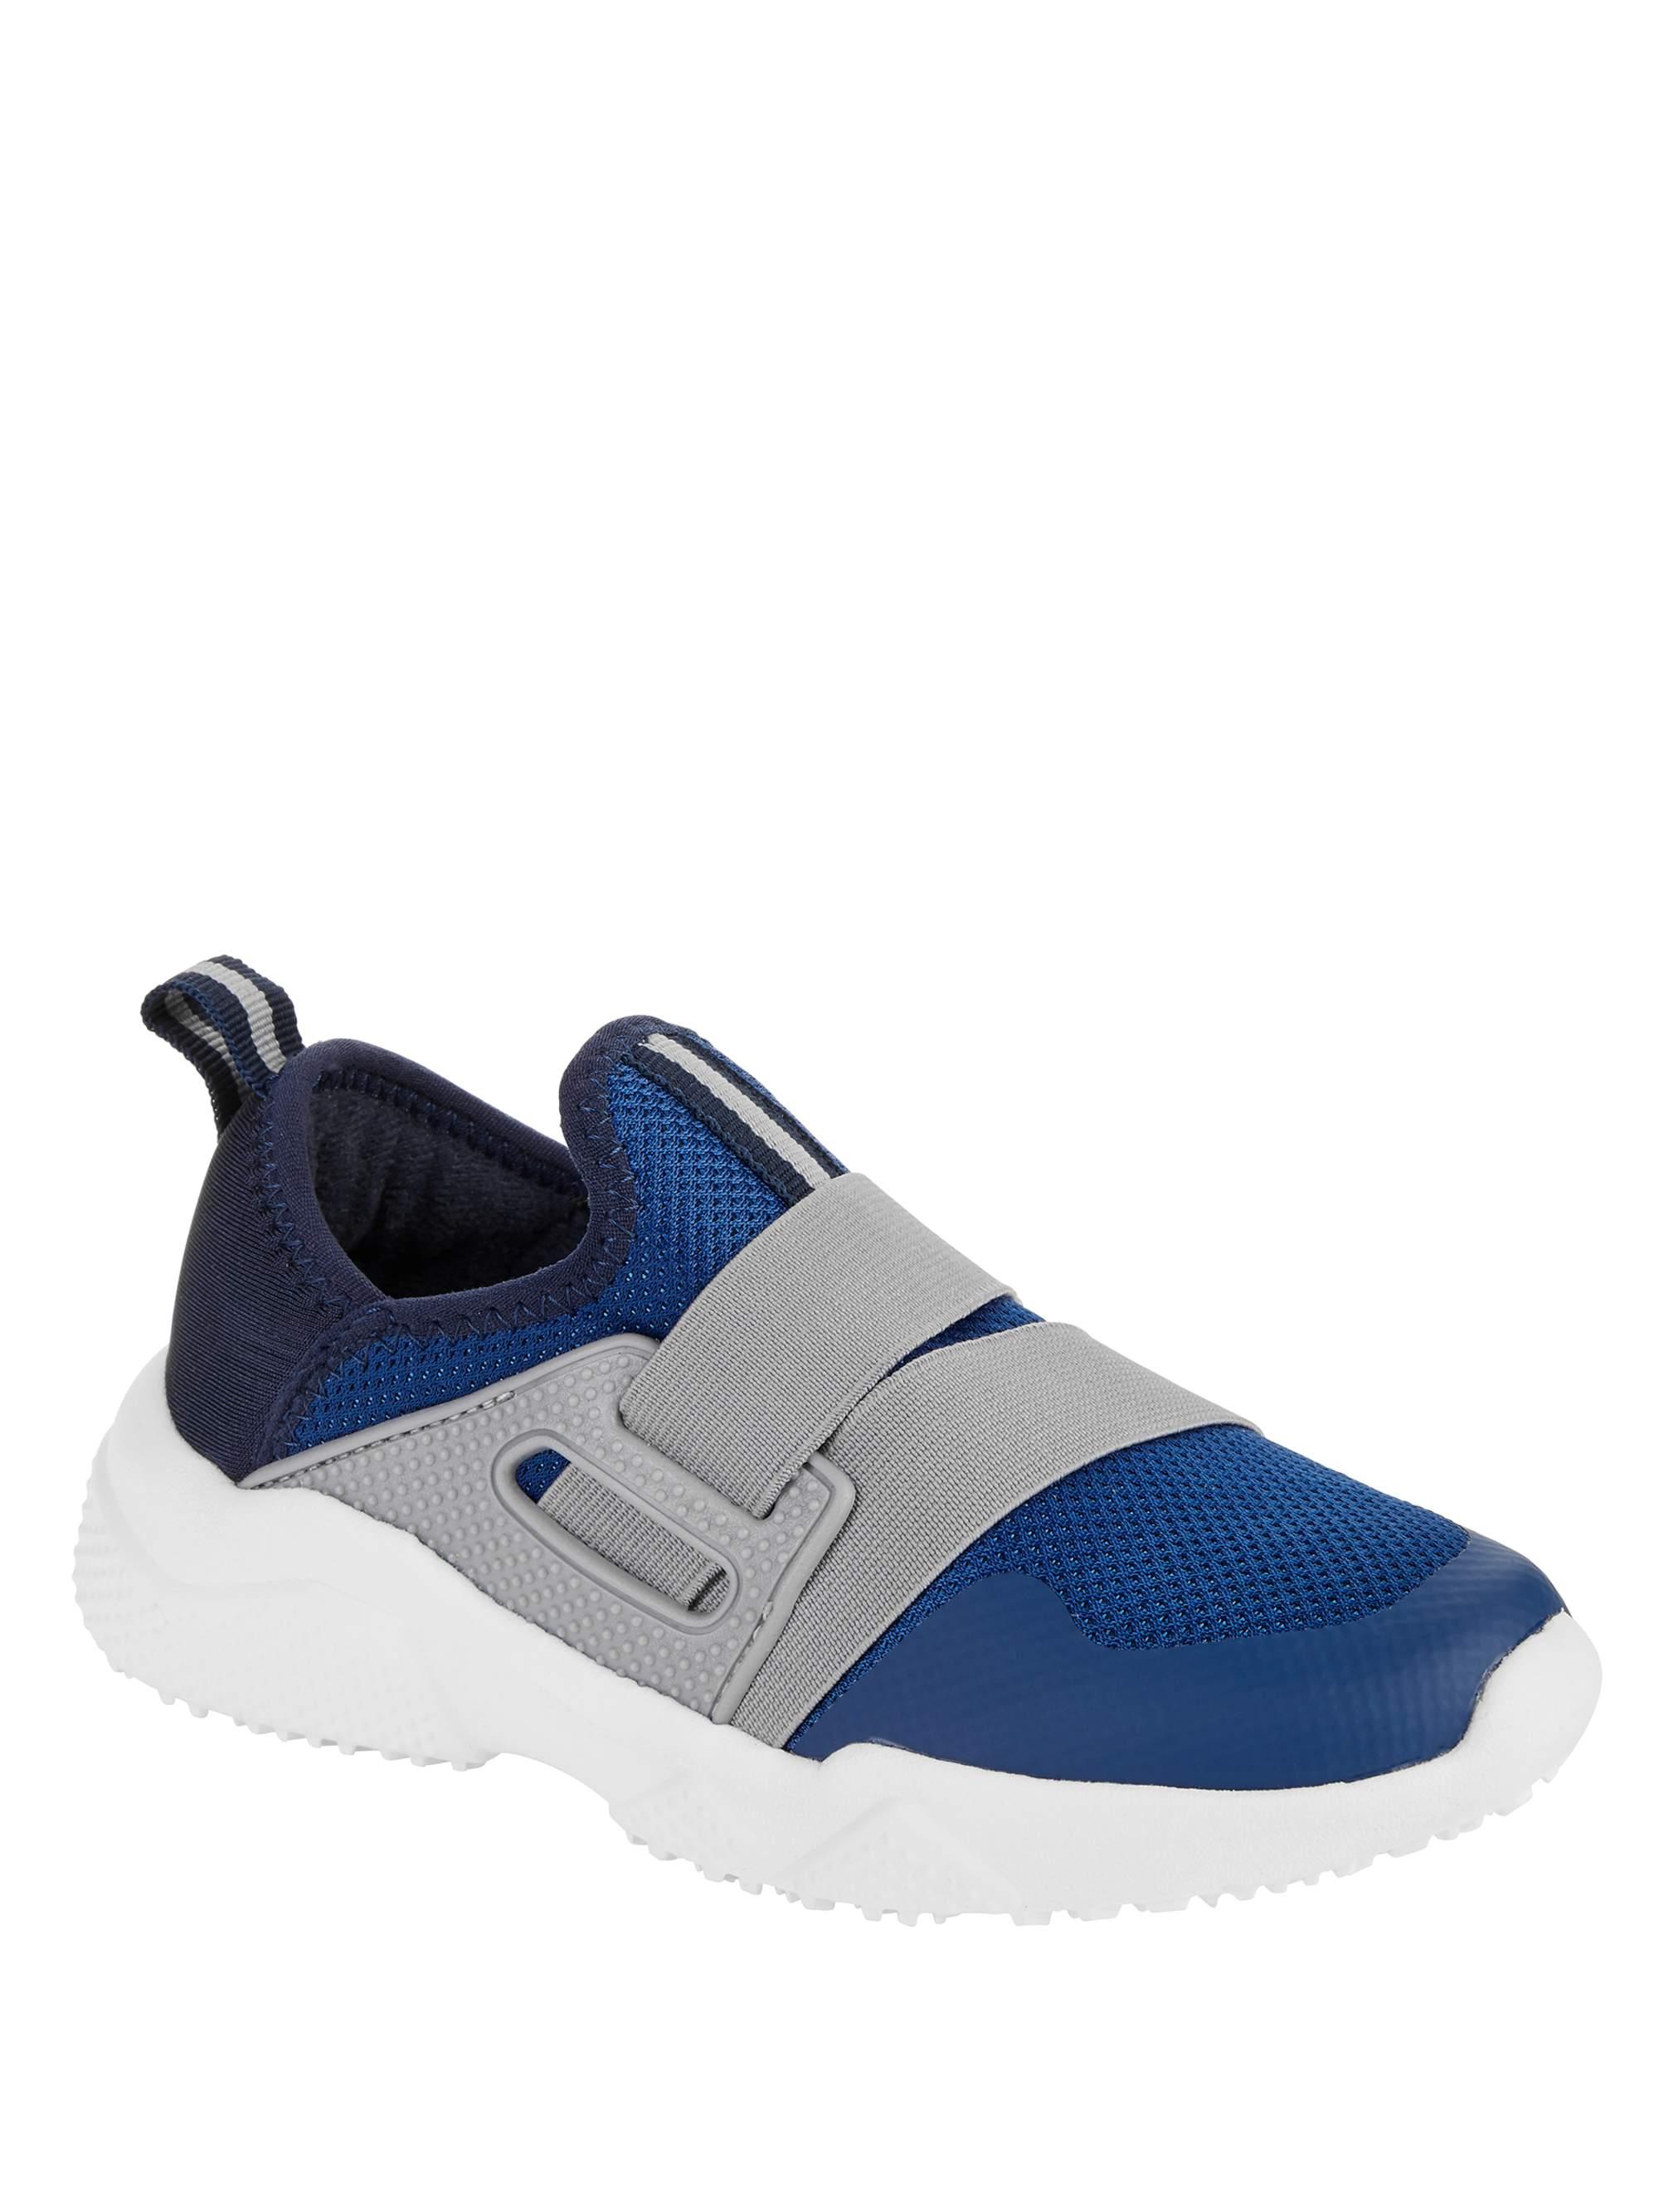 BoysSneakersWalmart.jpg